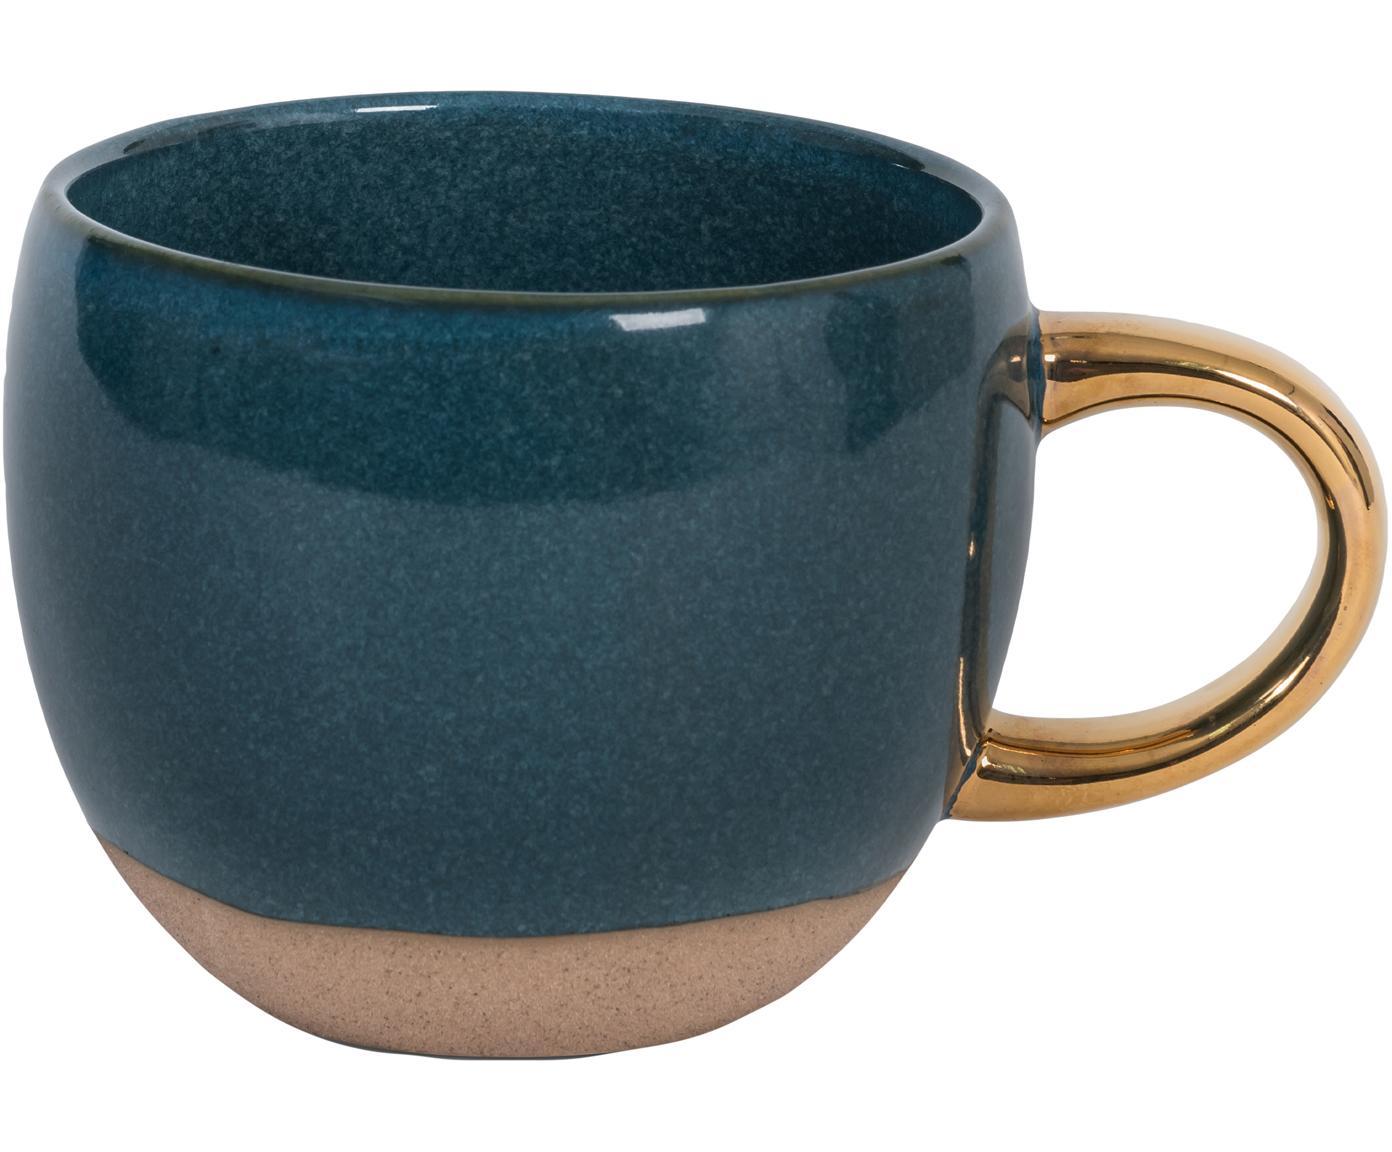 Taza Legion, Gres, Azul, dorado, Ø 11 x Al 9 cm